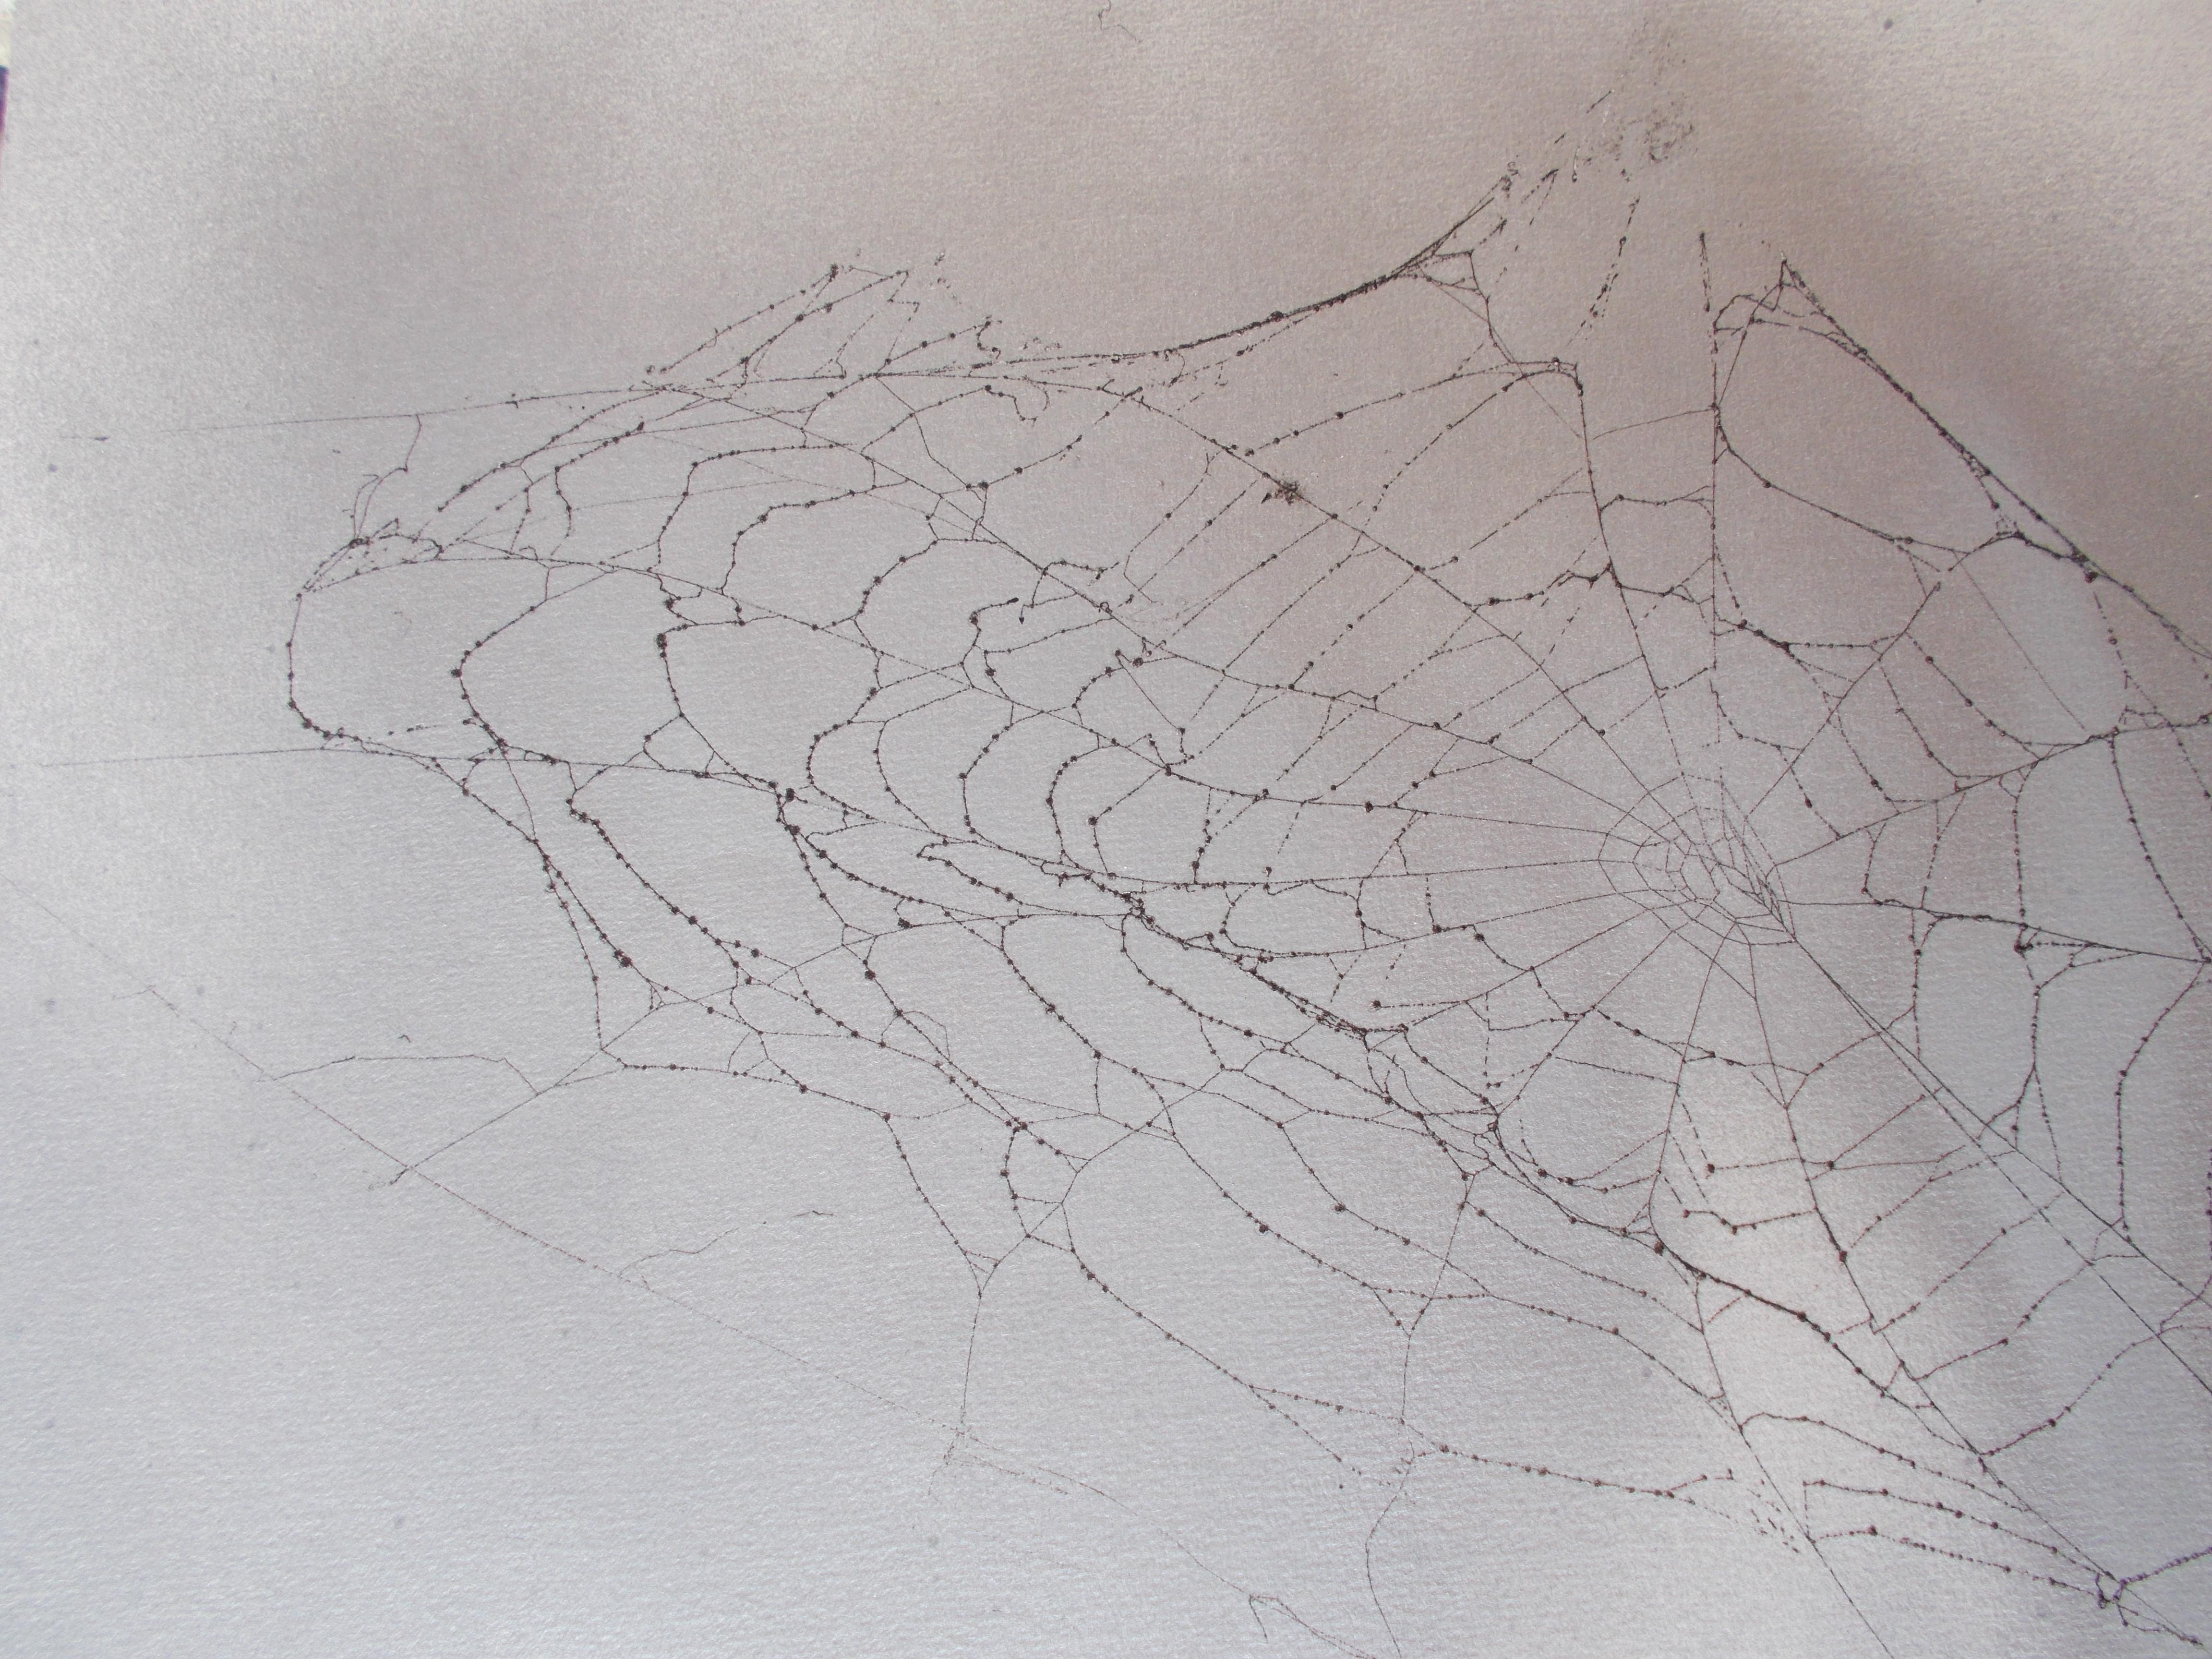 Netz im Nebel